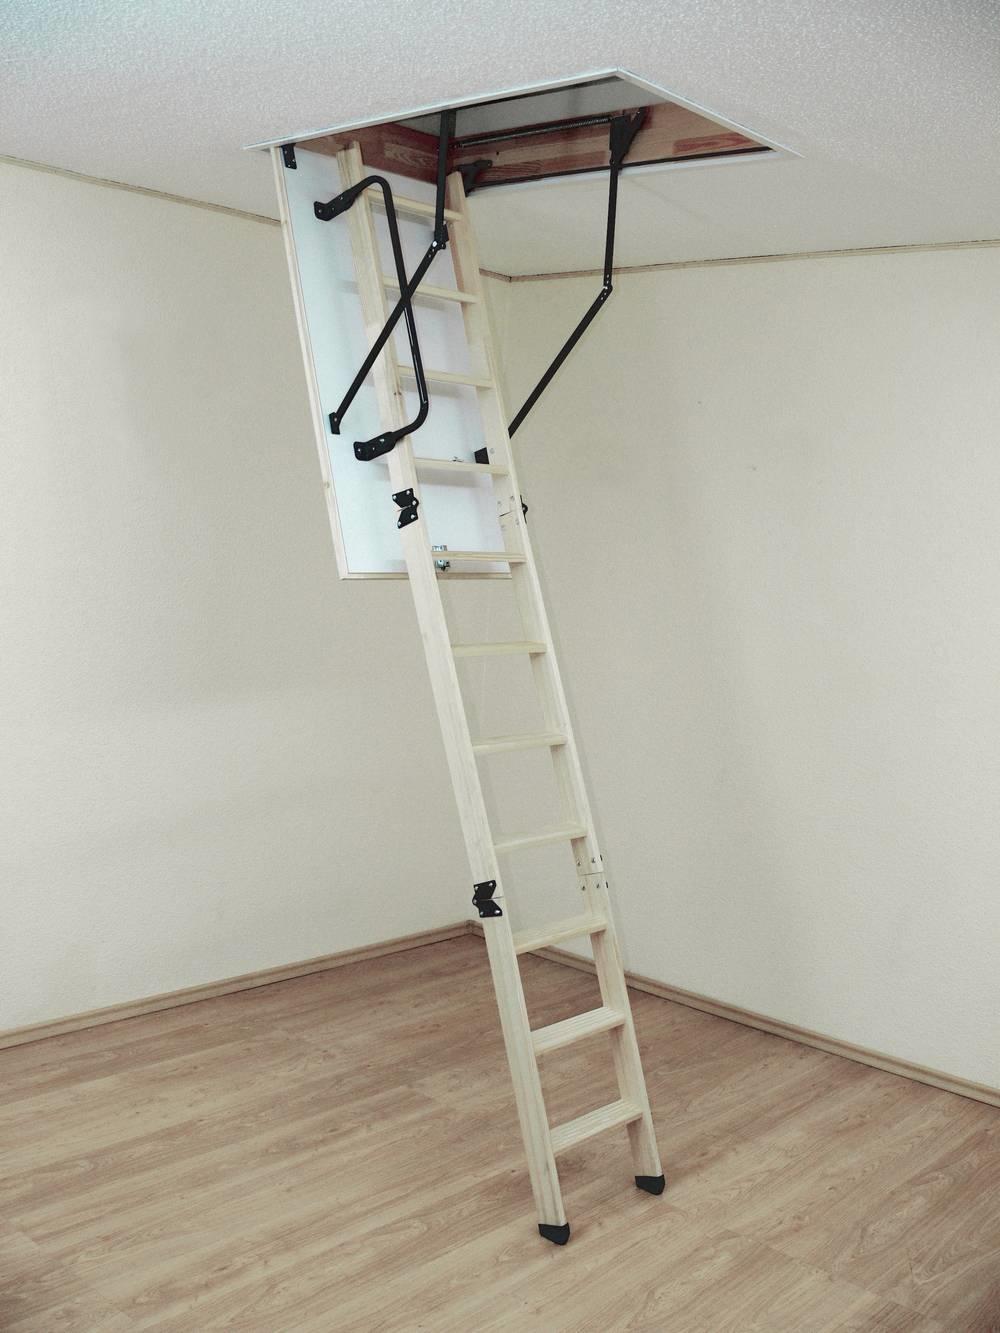 Woodytrex-Superieur 3-delige zoldertrap (inklap) 120 x 60